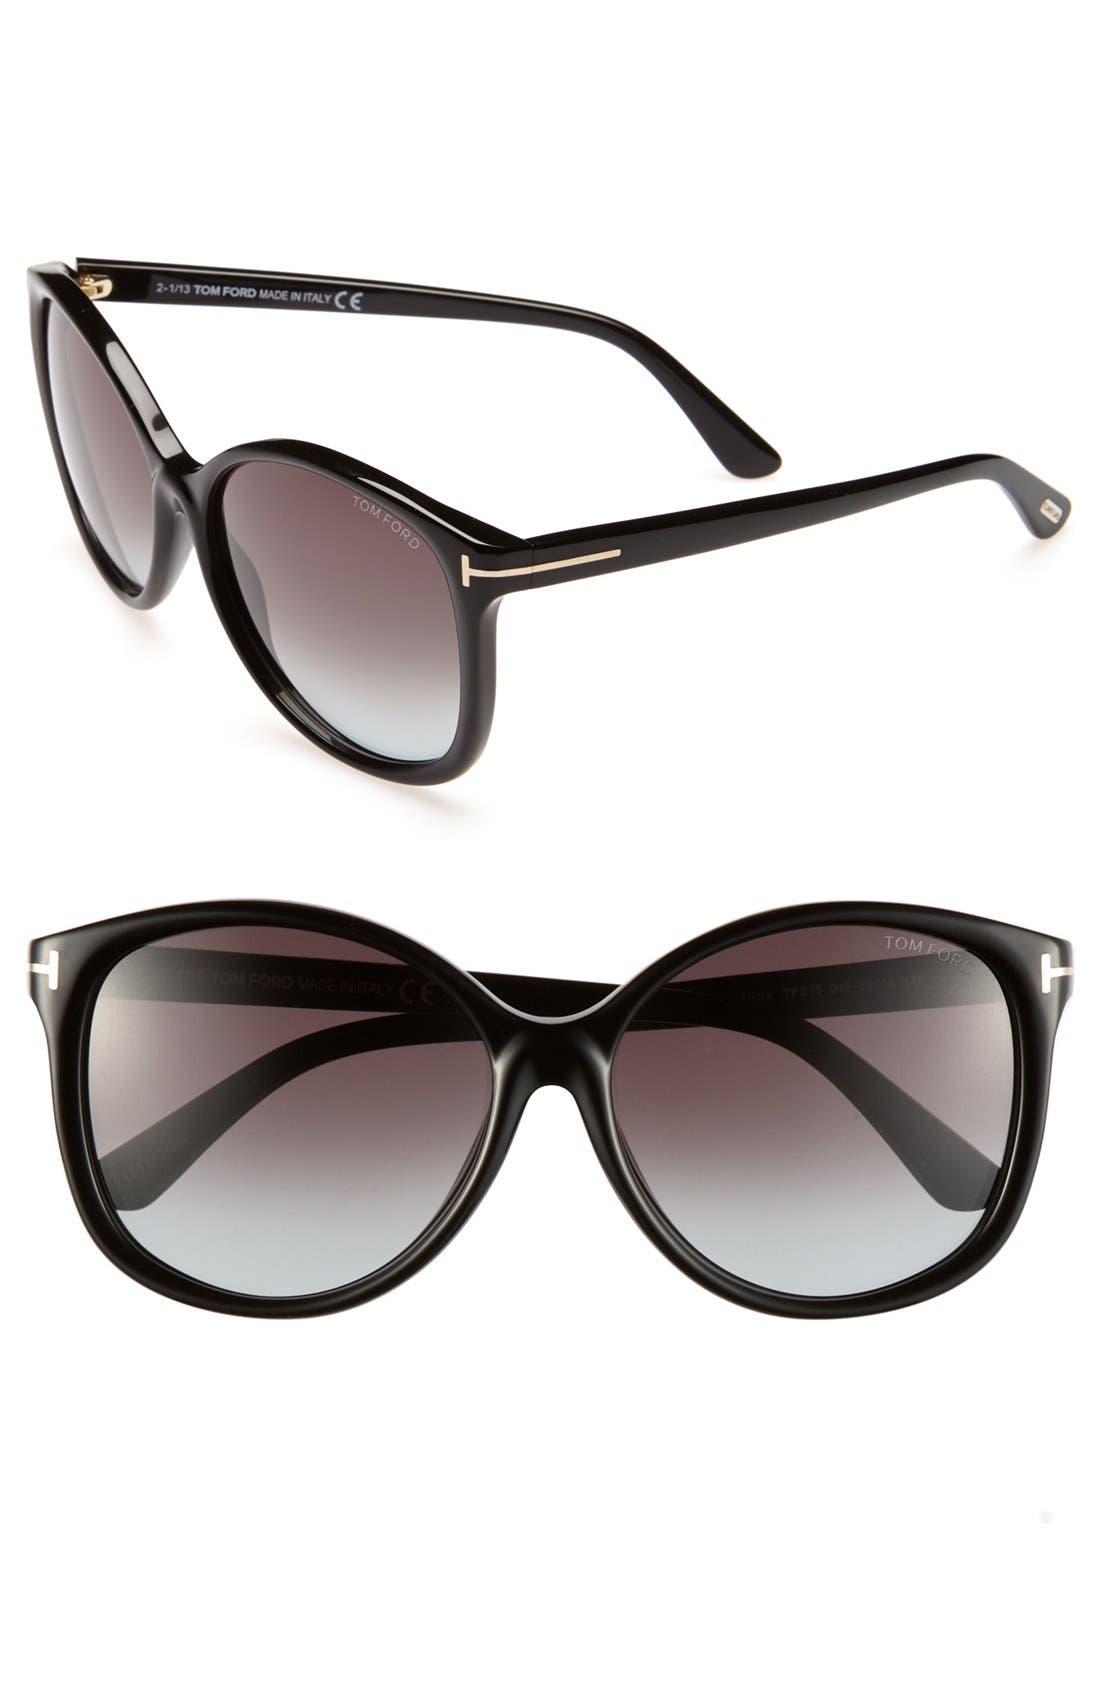 Tom Ford 'Alicia' 59mm Sunglasses